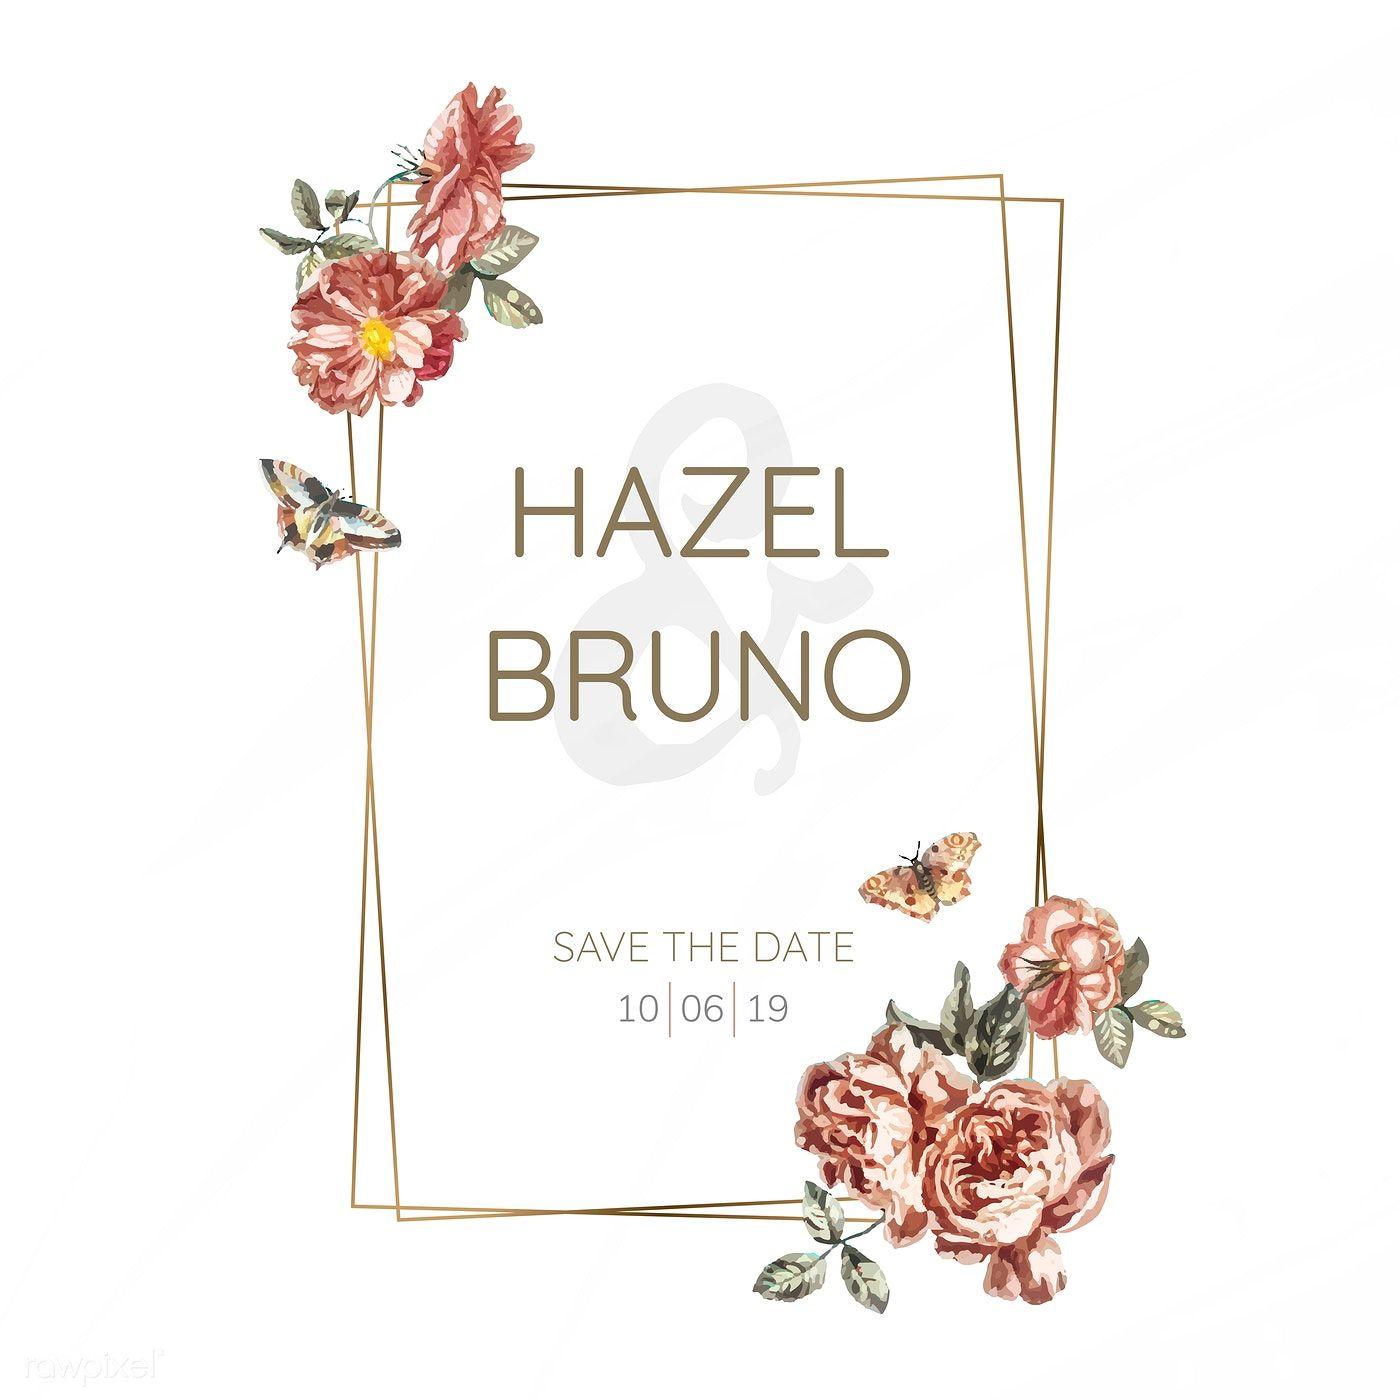 Download premium vector of Floral wedding invitation